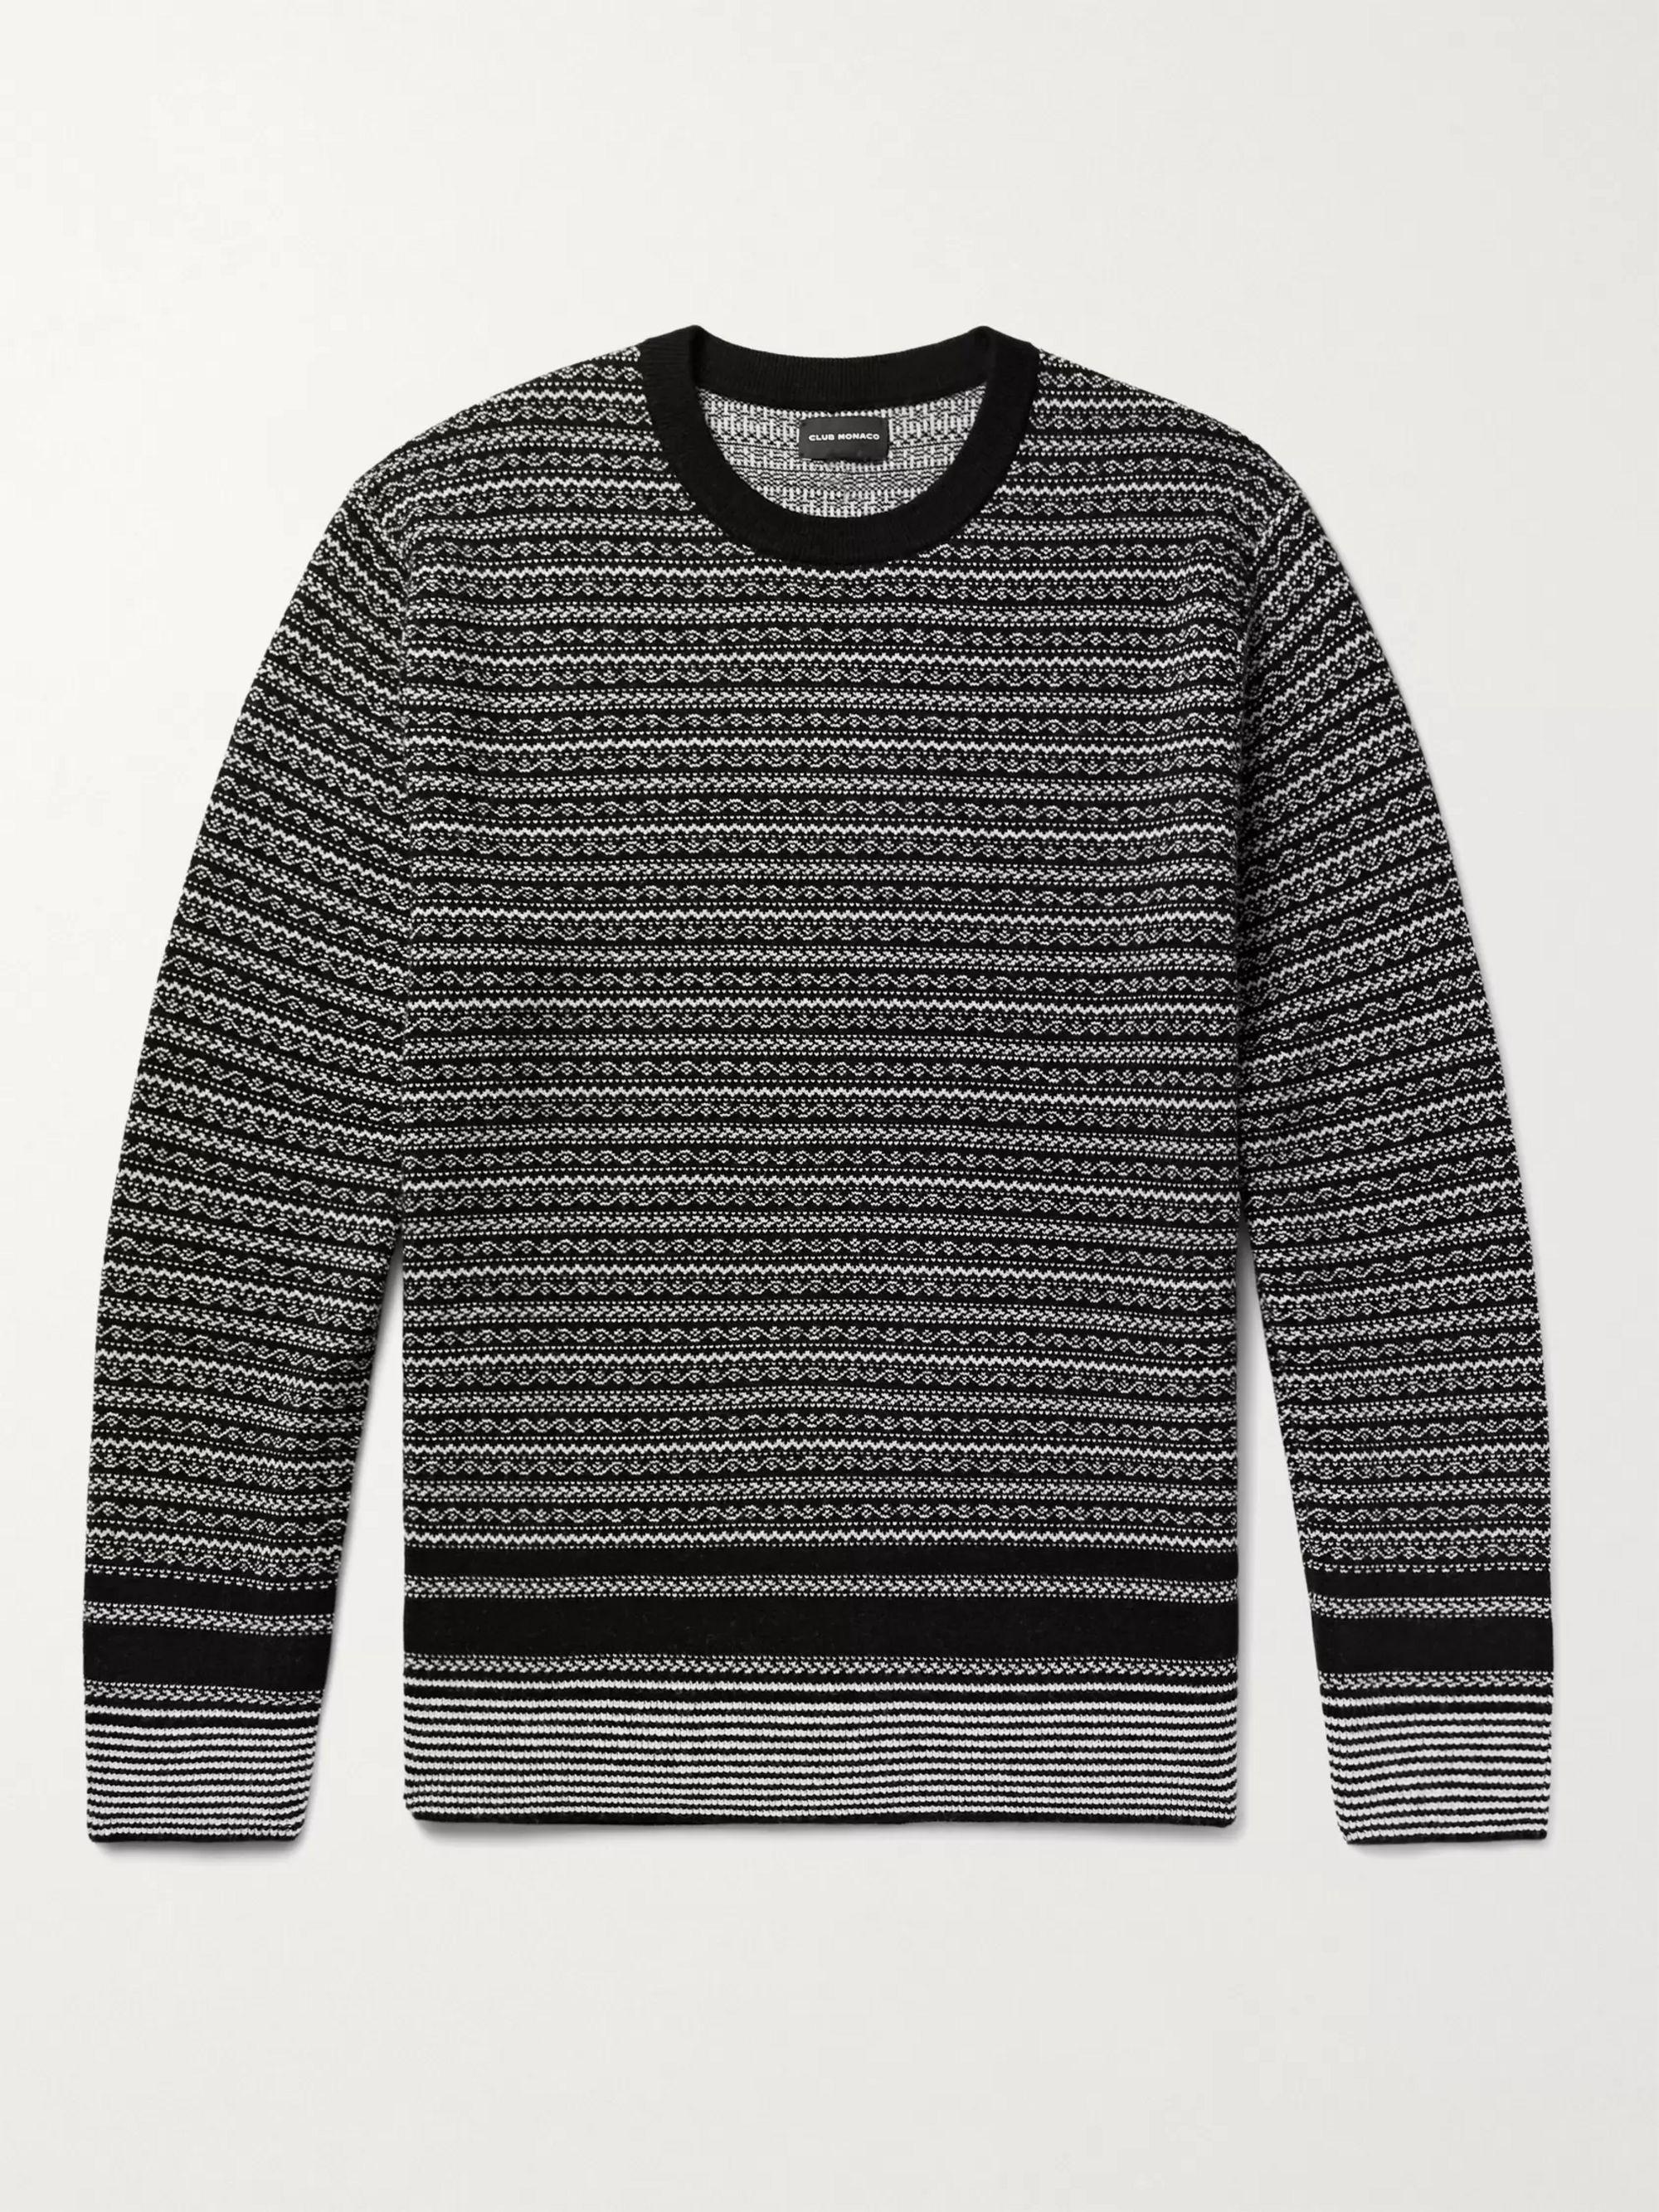 CLUB MONACO Fair Isle Jacquard-Knit Sweater